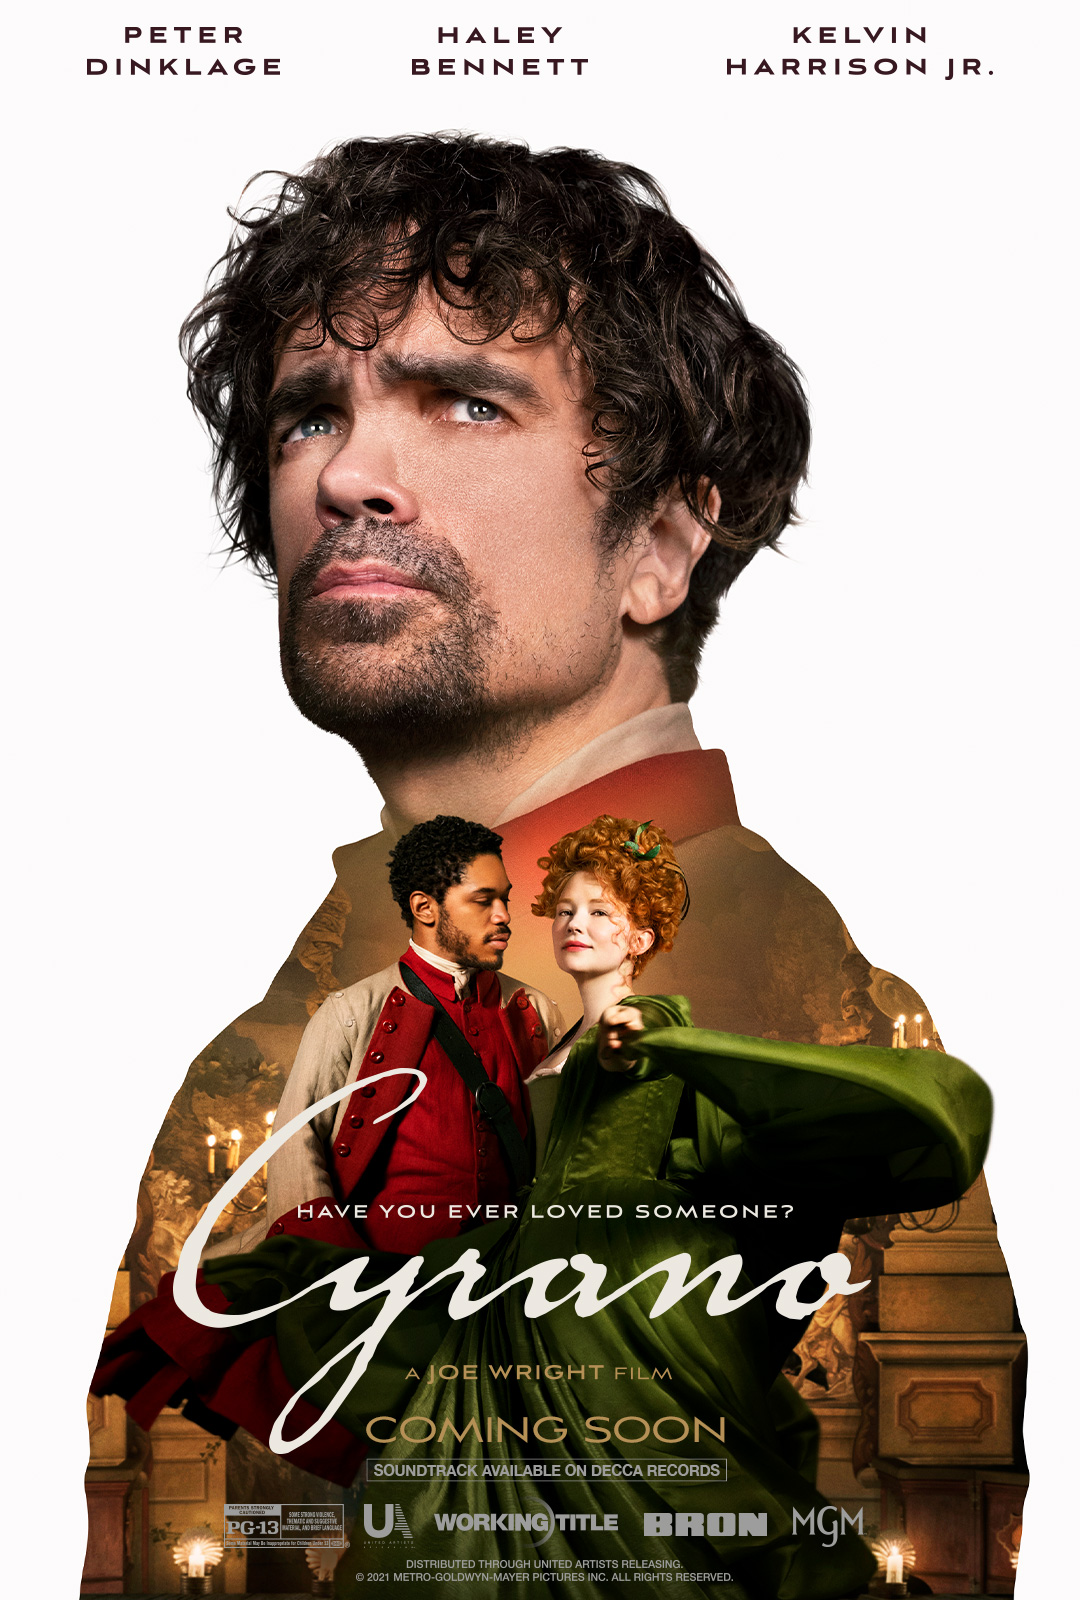 Poster for Cyrano